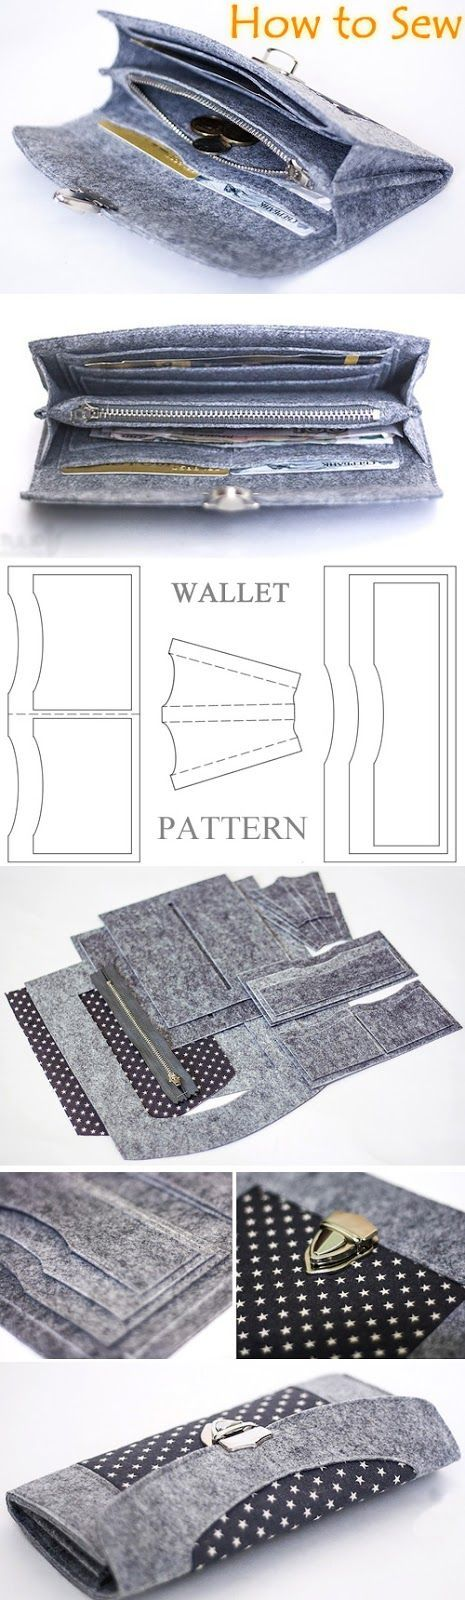 How to Sew a Felt Wallet   Purse. Tutorial  fb15dbd41195c